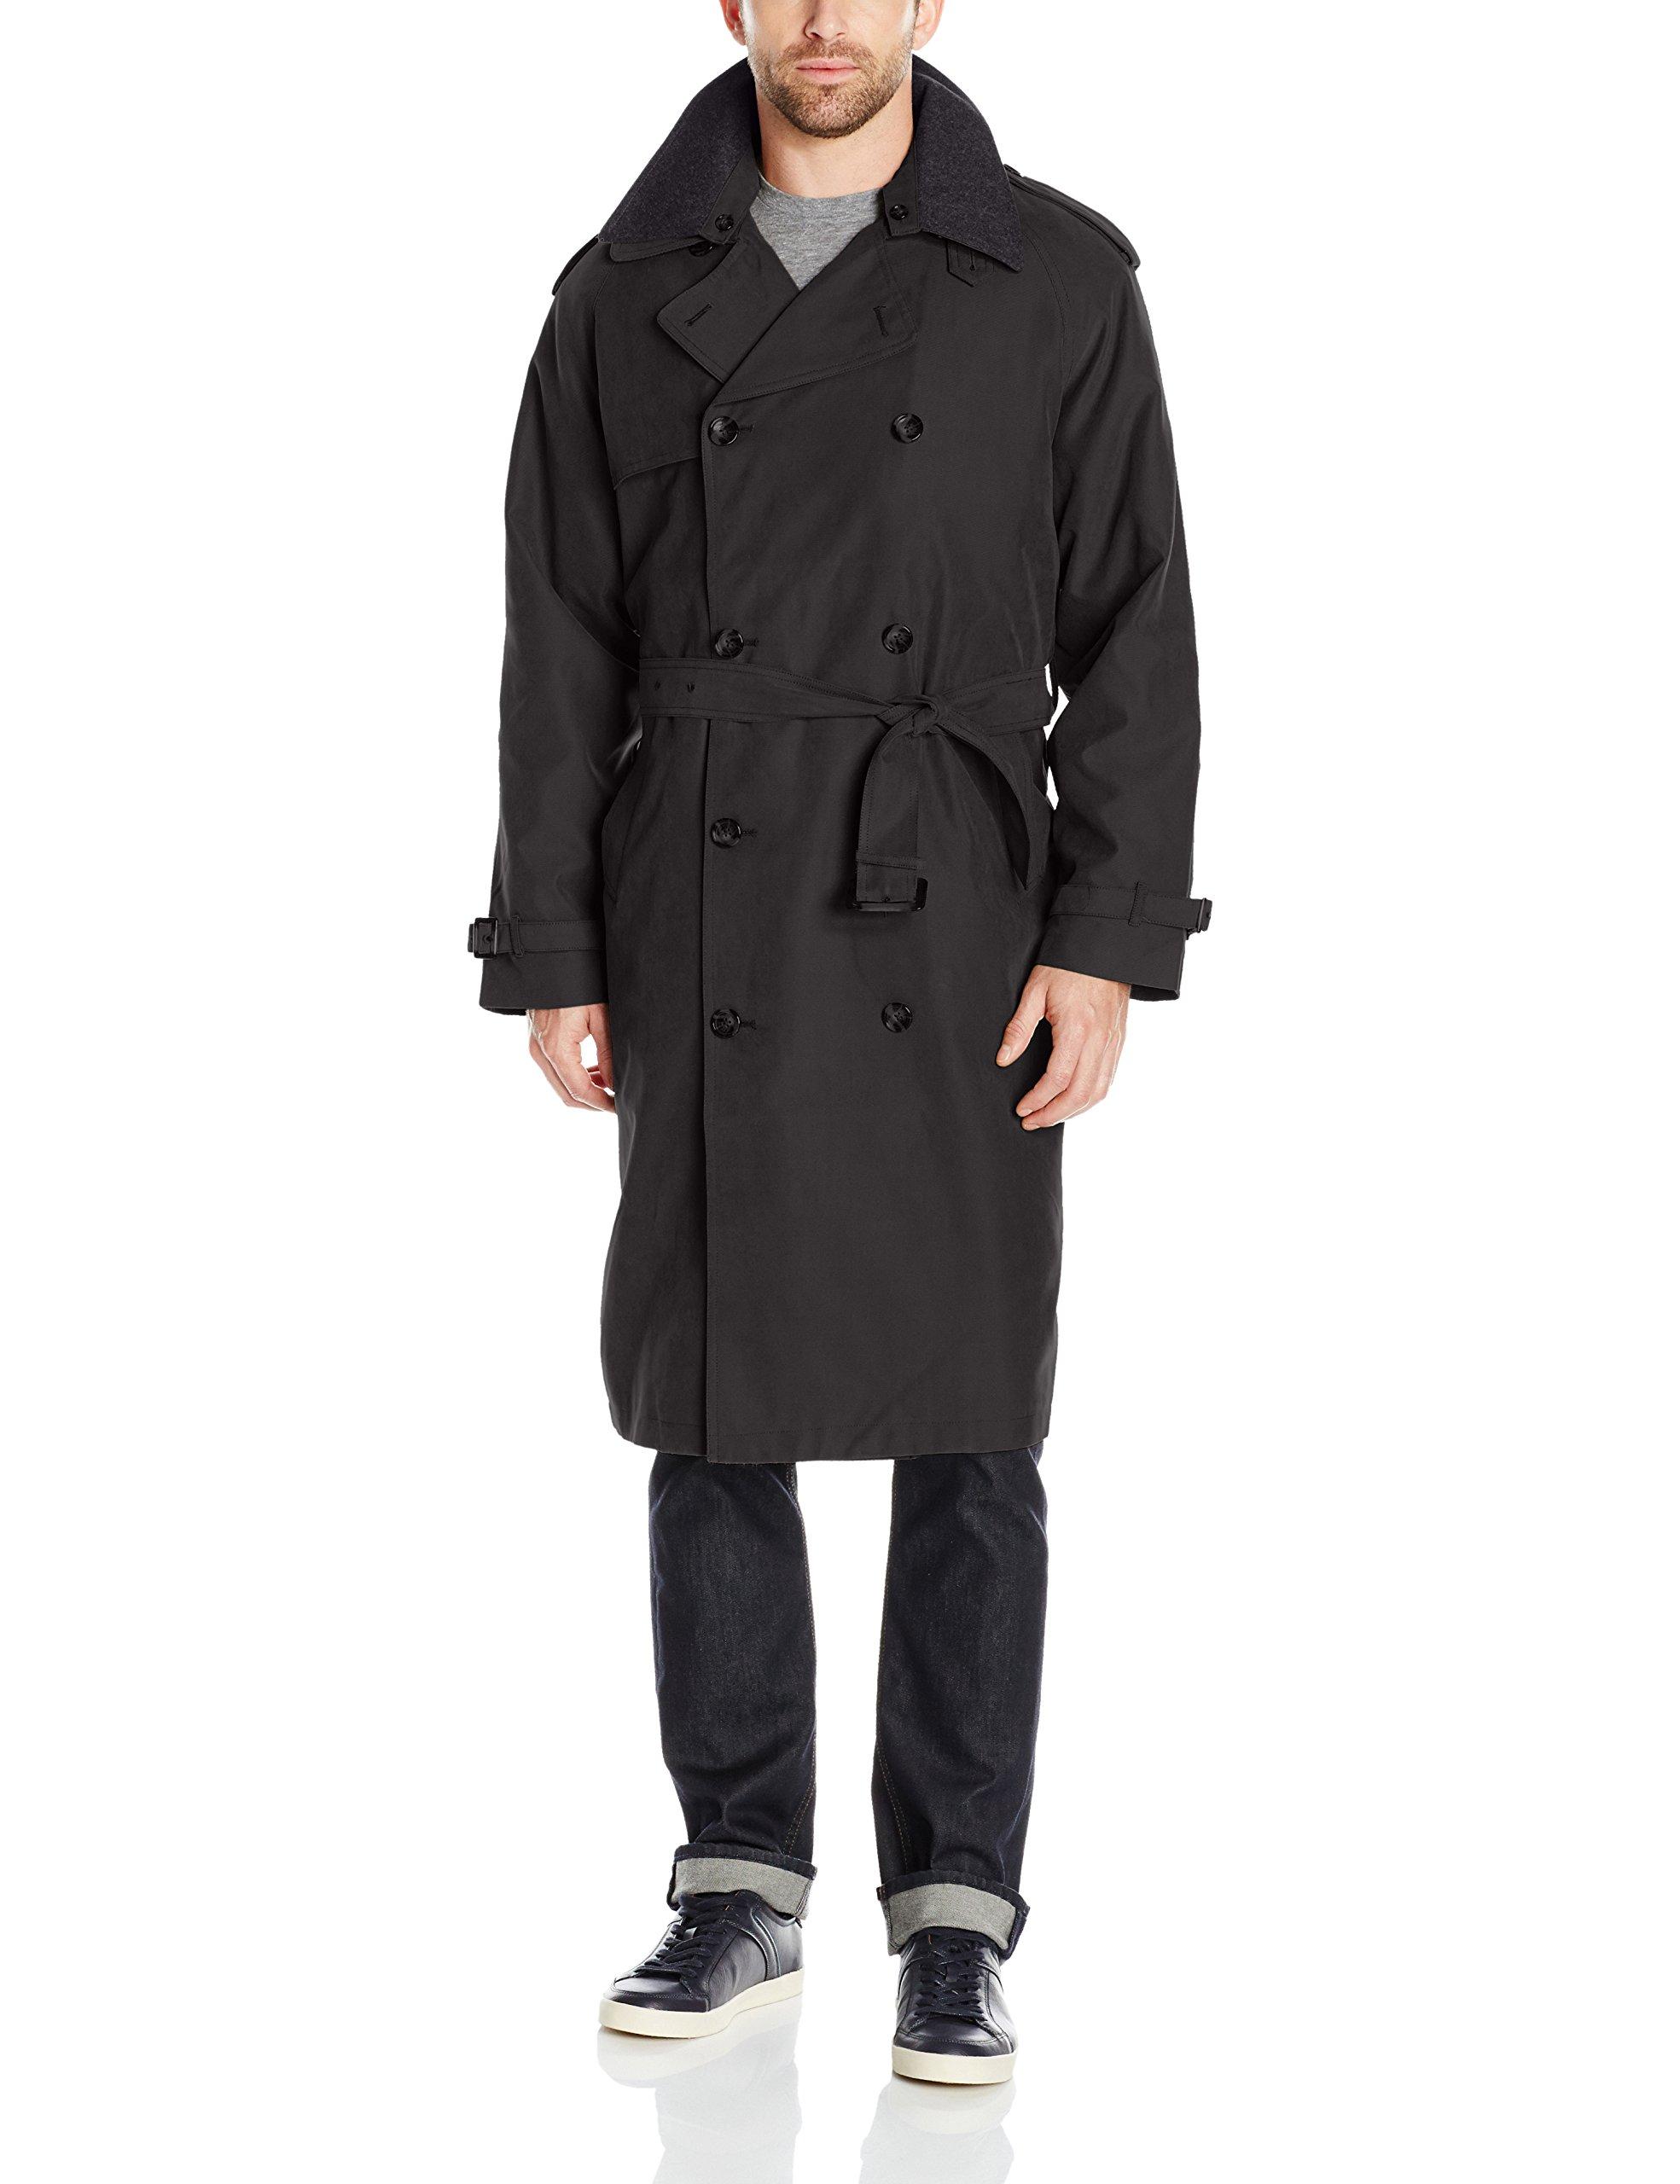 London Fog Men's Iconic Trench Coat, Black, 40 Long by London Fog